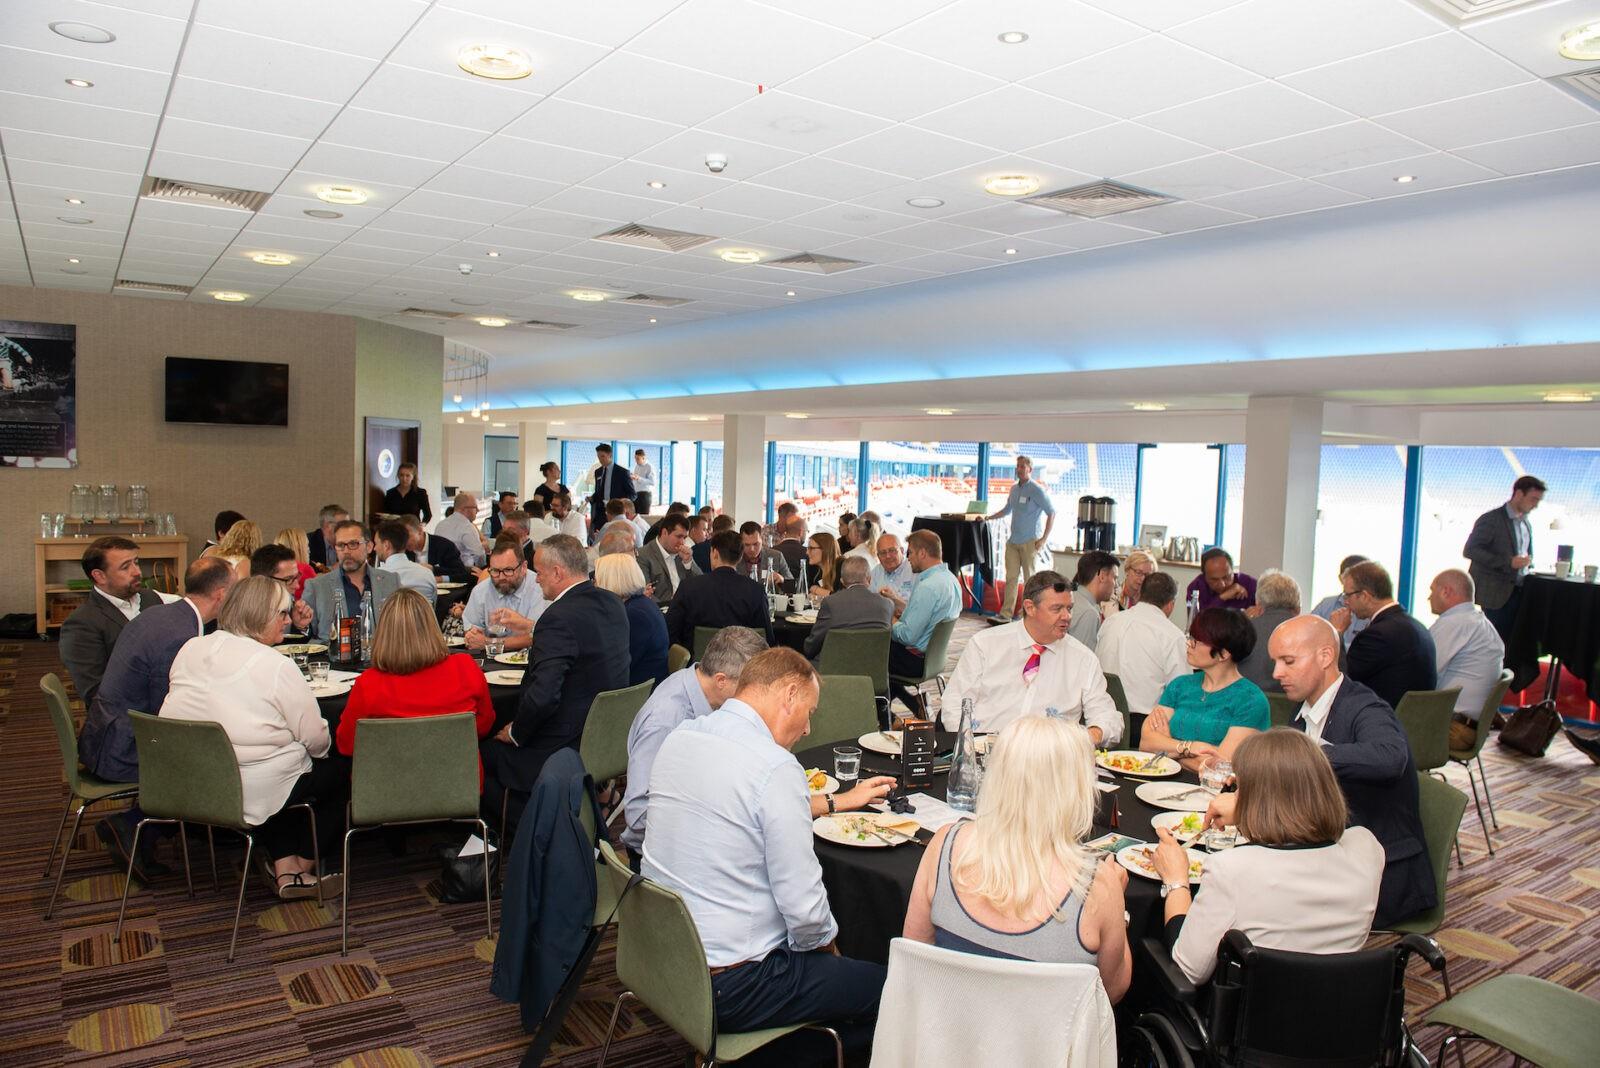 Business networking, networking event, madejski stadium, reading football club, network my club, network royals business club, berkshire, thames valley